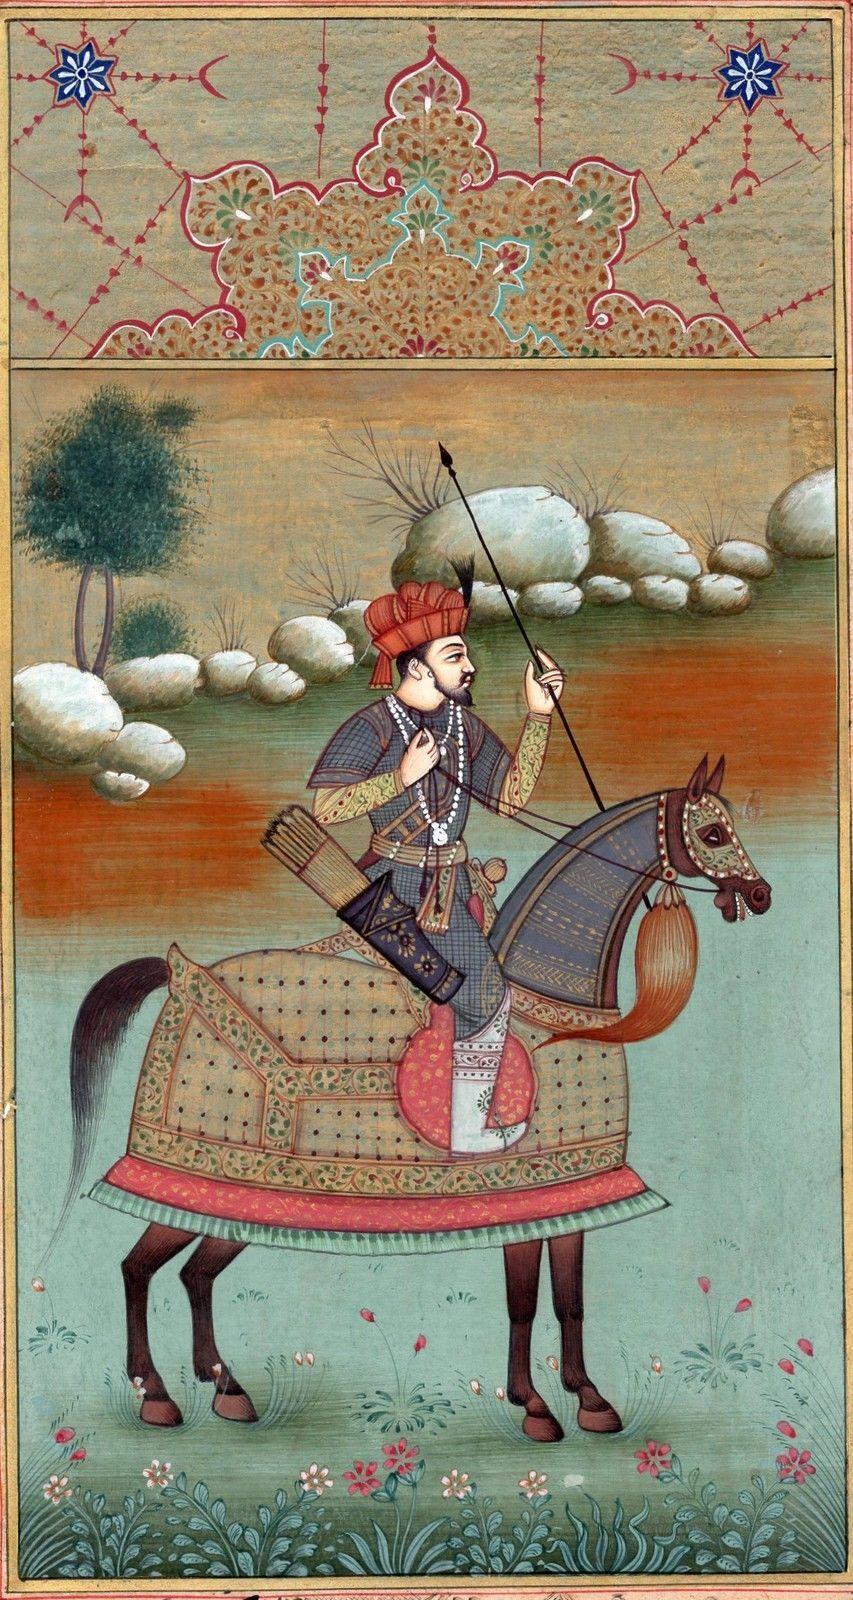 Mughal Miniature Painting Rare Handmade Timur Equestrian